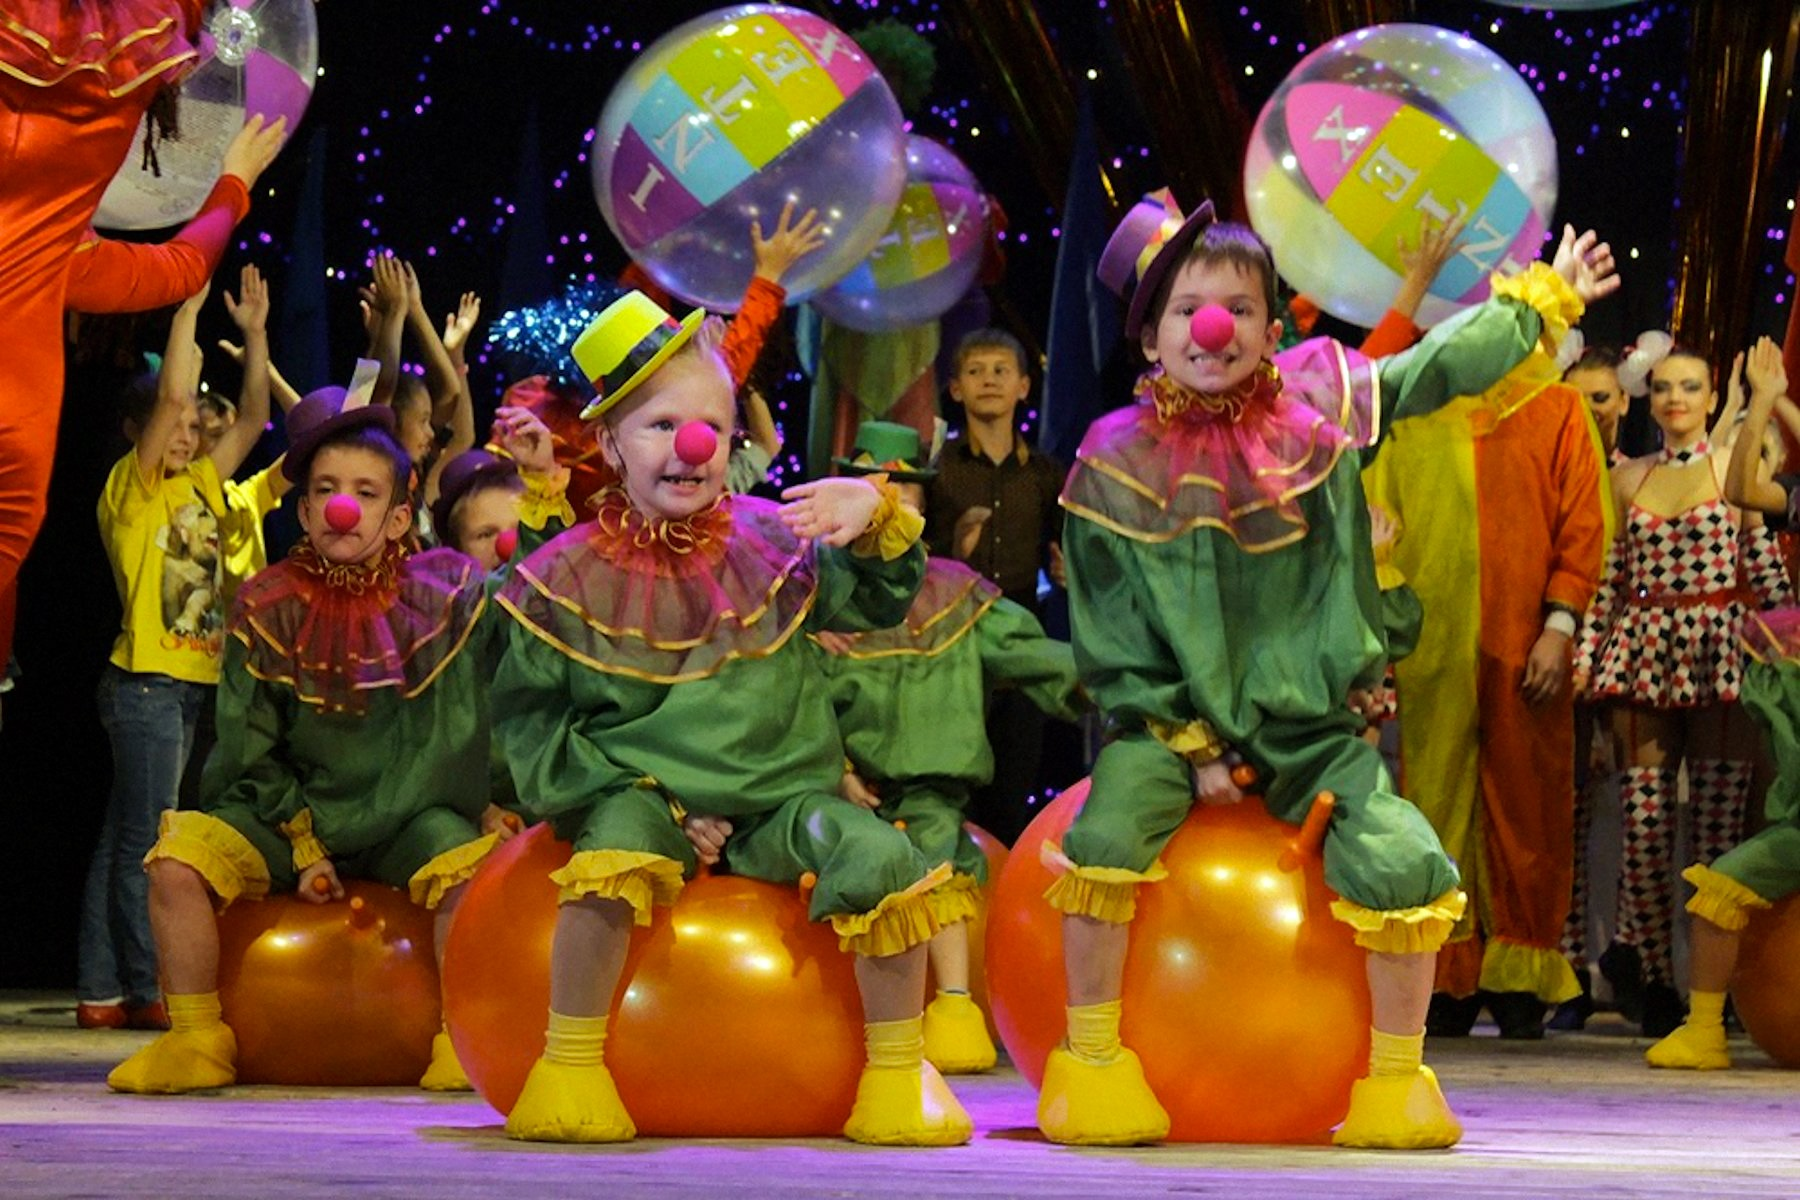 00 lnr lugask pr circus of the future 05 041015